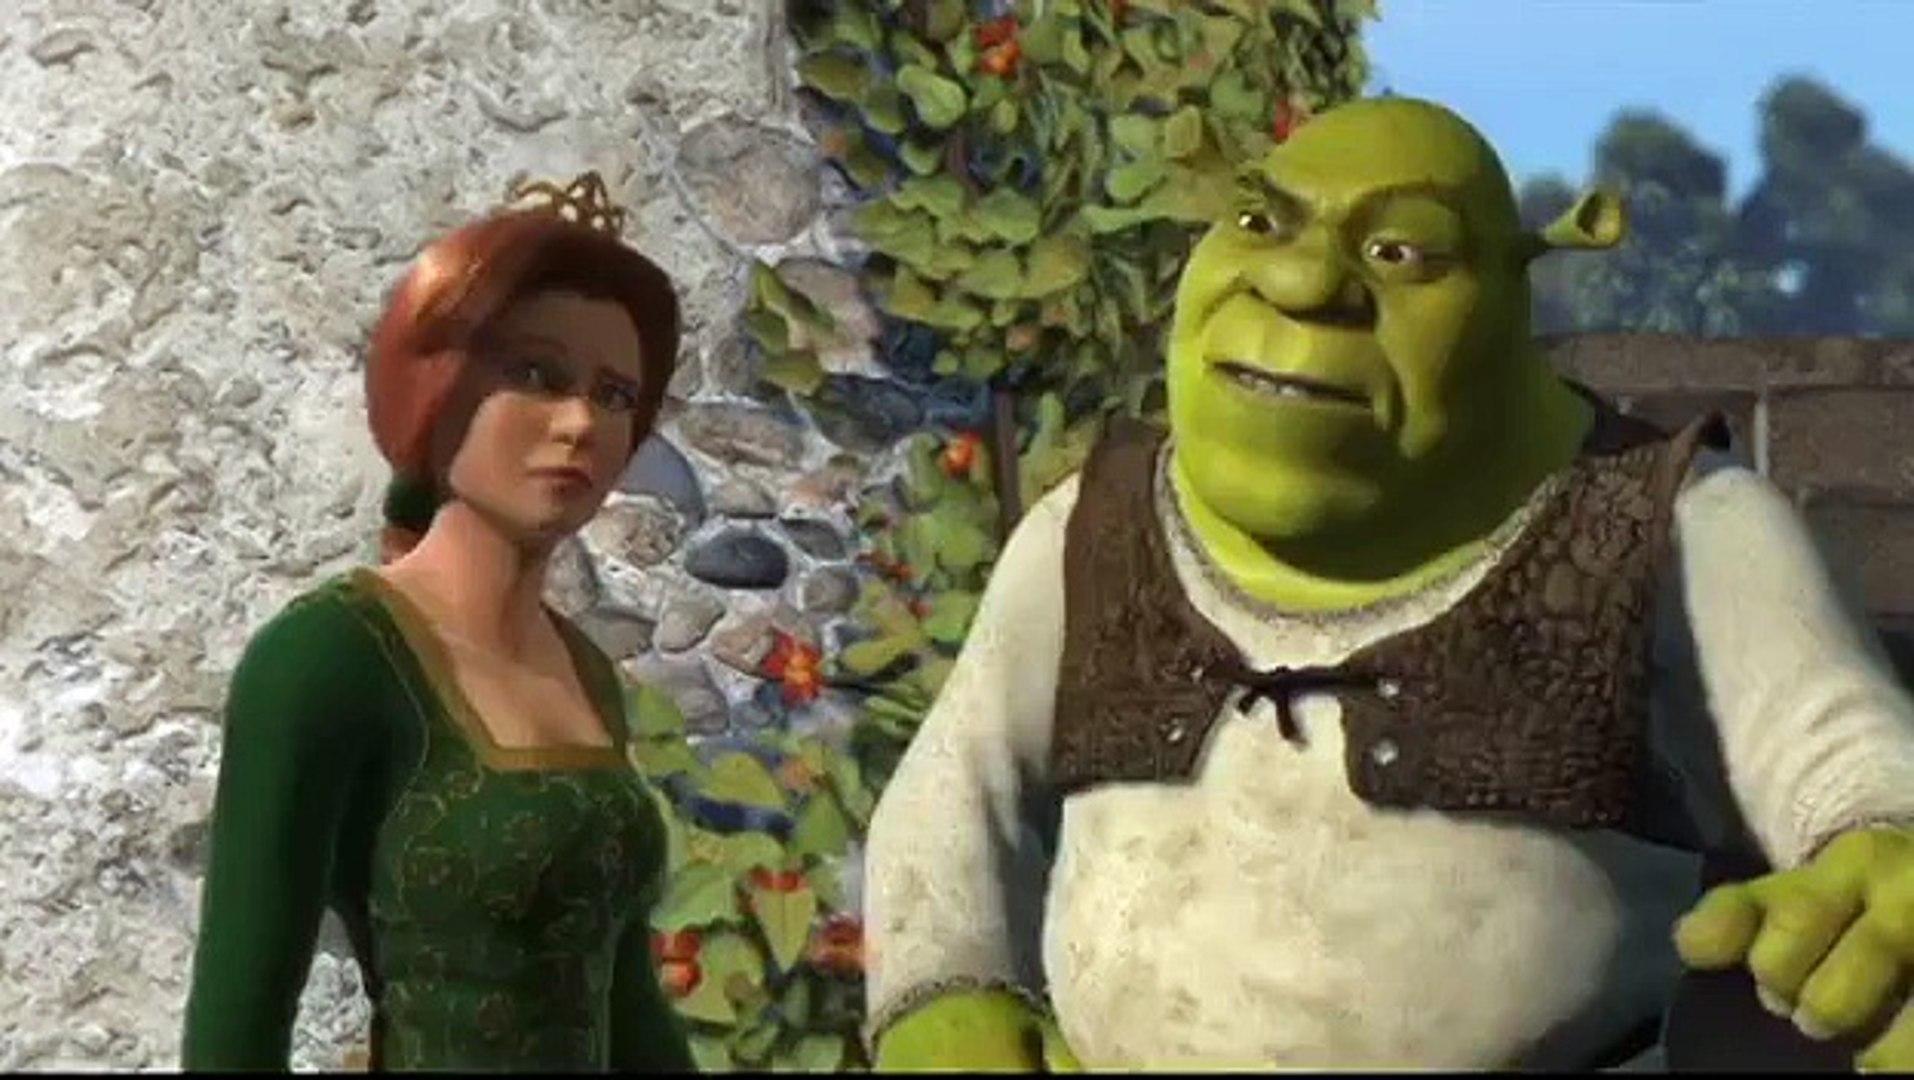 Shrek the TV shows